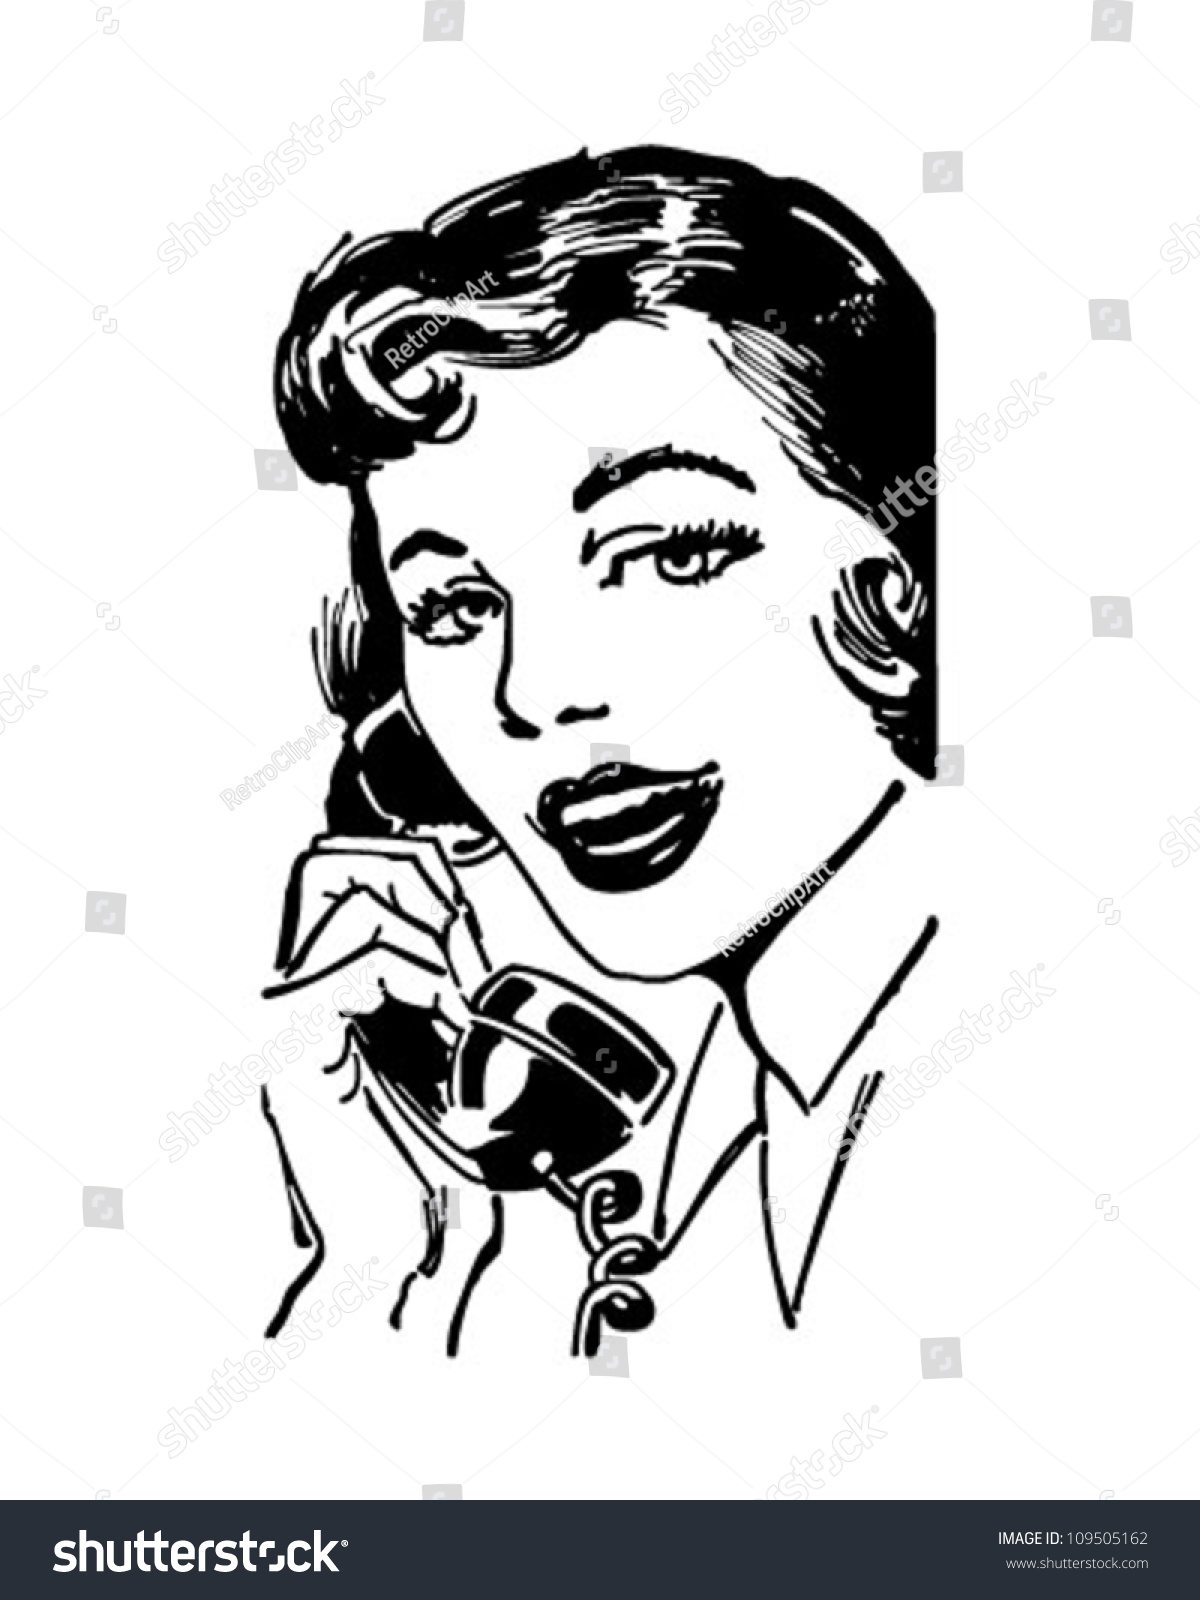 Telephone Gal - Retro Clipart Illustration - 109505162 : Shutterstock